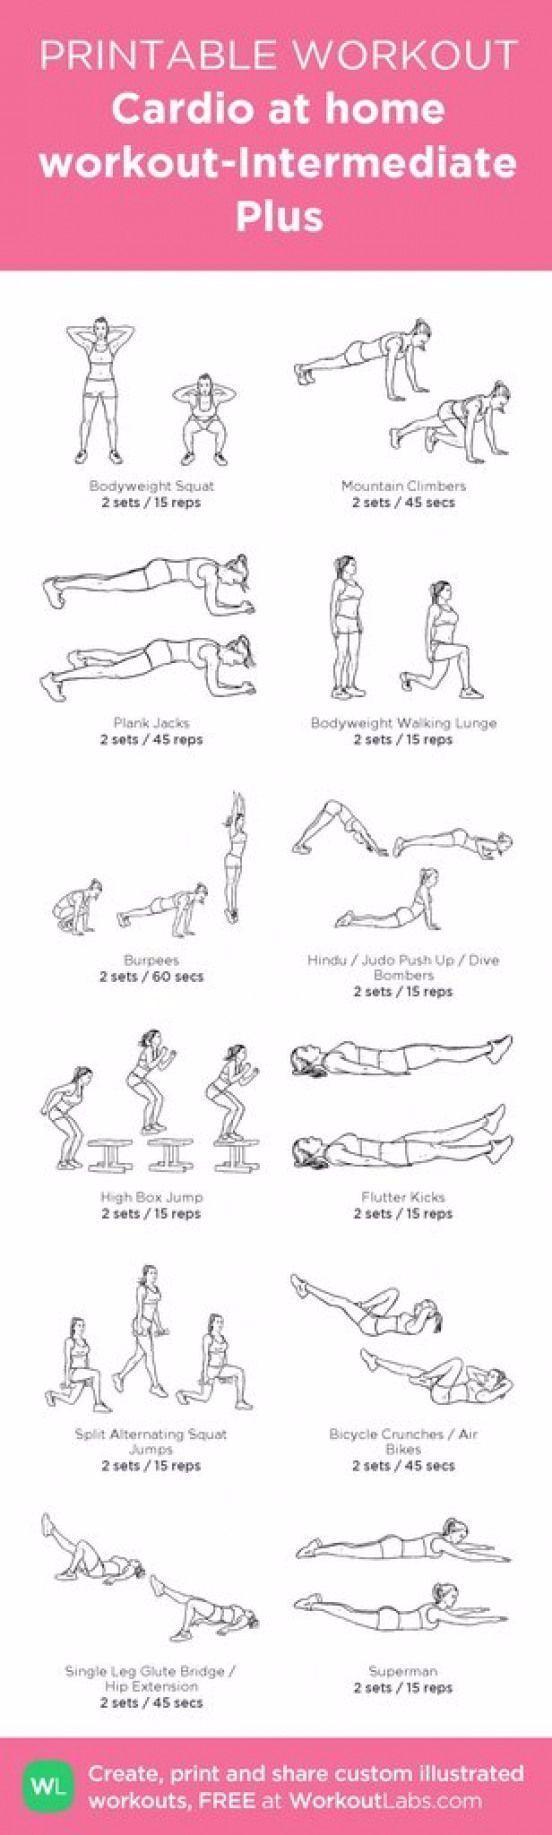 #Aerobic #aerobicexercises #bestes workout für zuhause #fitness #Pinterest #POPSUGAR #Posters #worko...